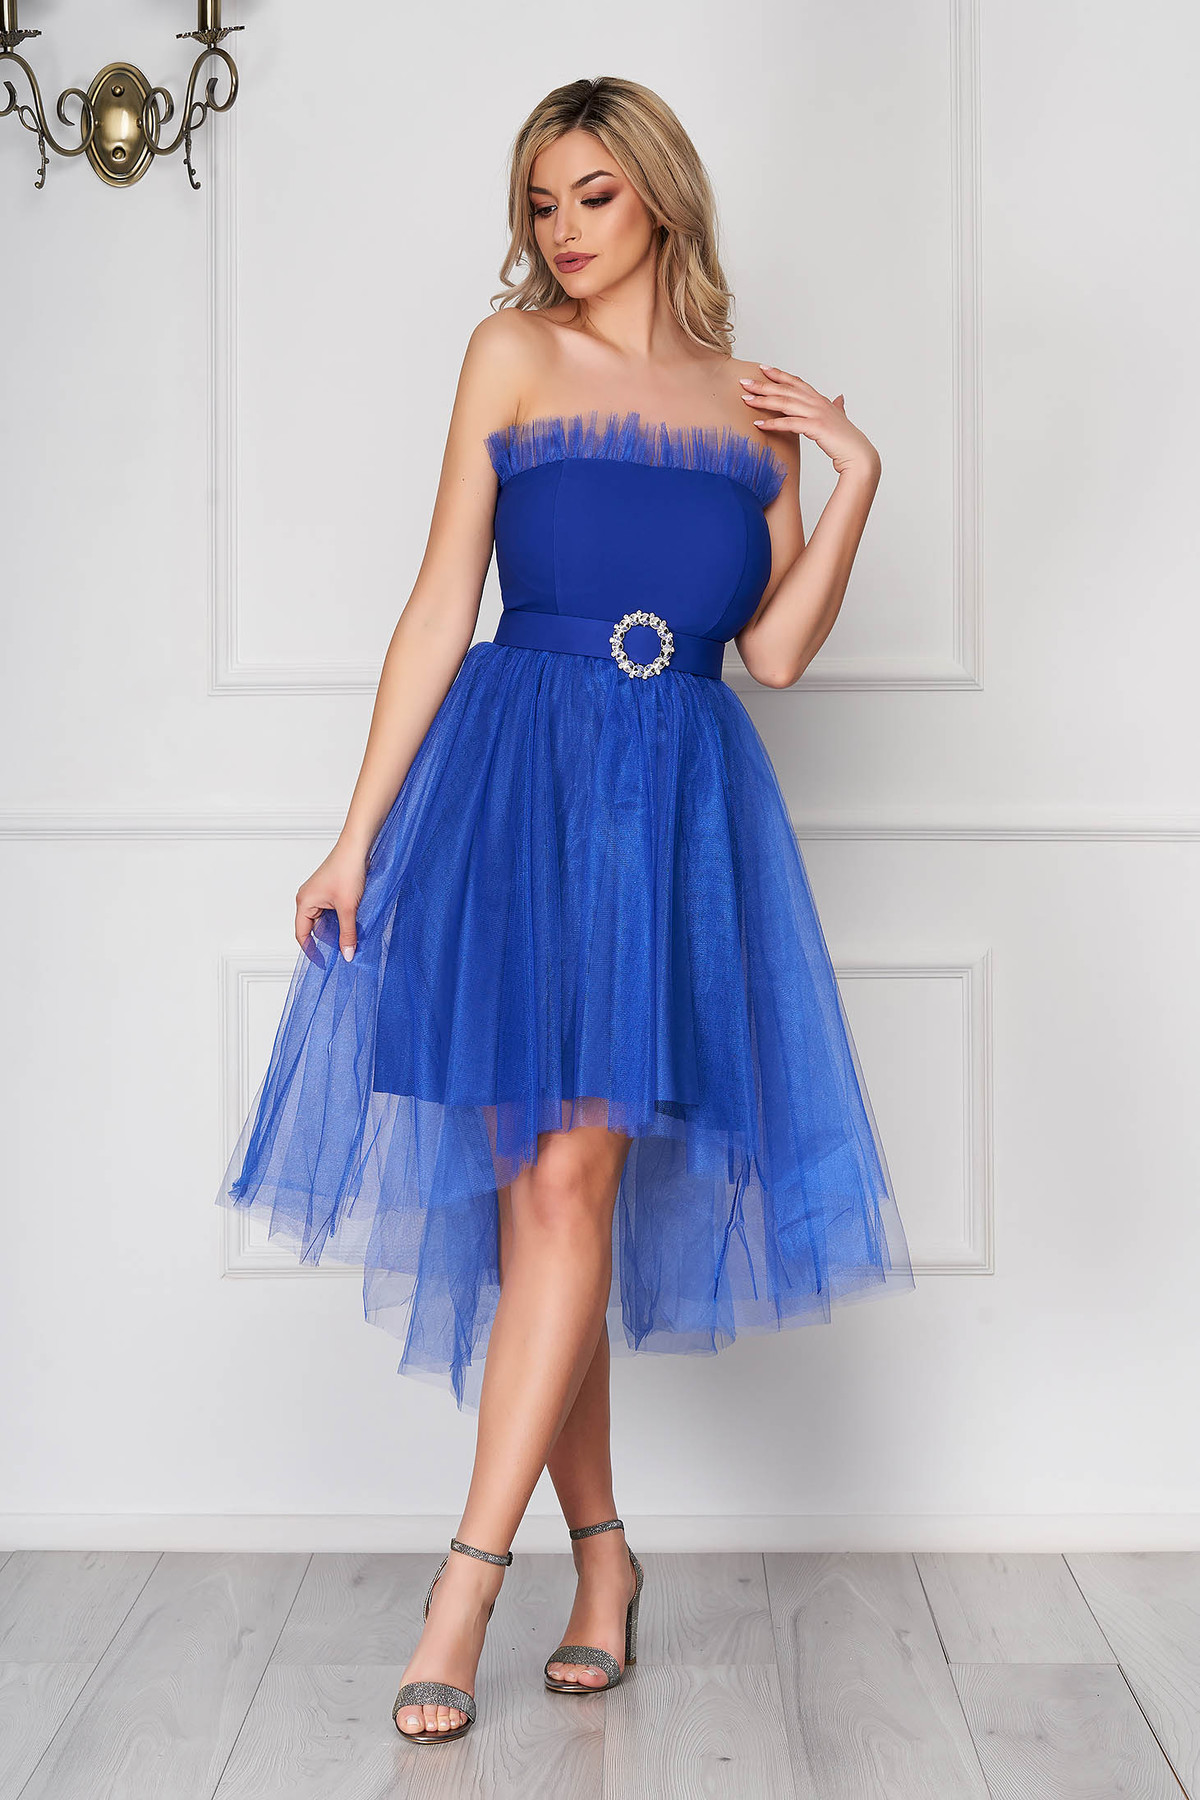 Rochie albastra scurta de ocazie asimetrica in clos din tul fara bretele